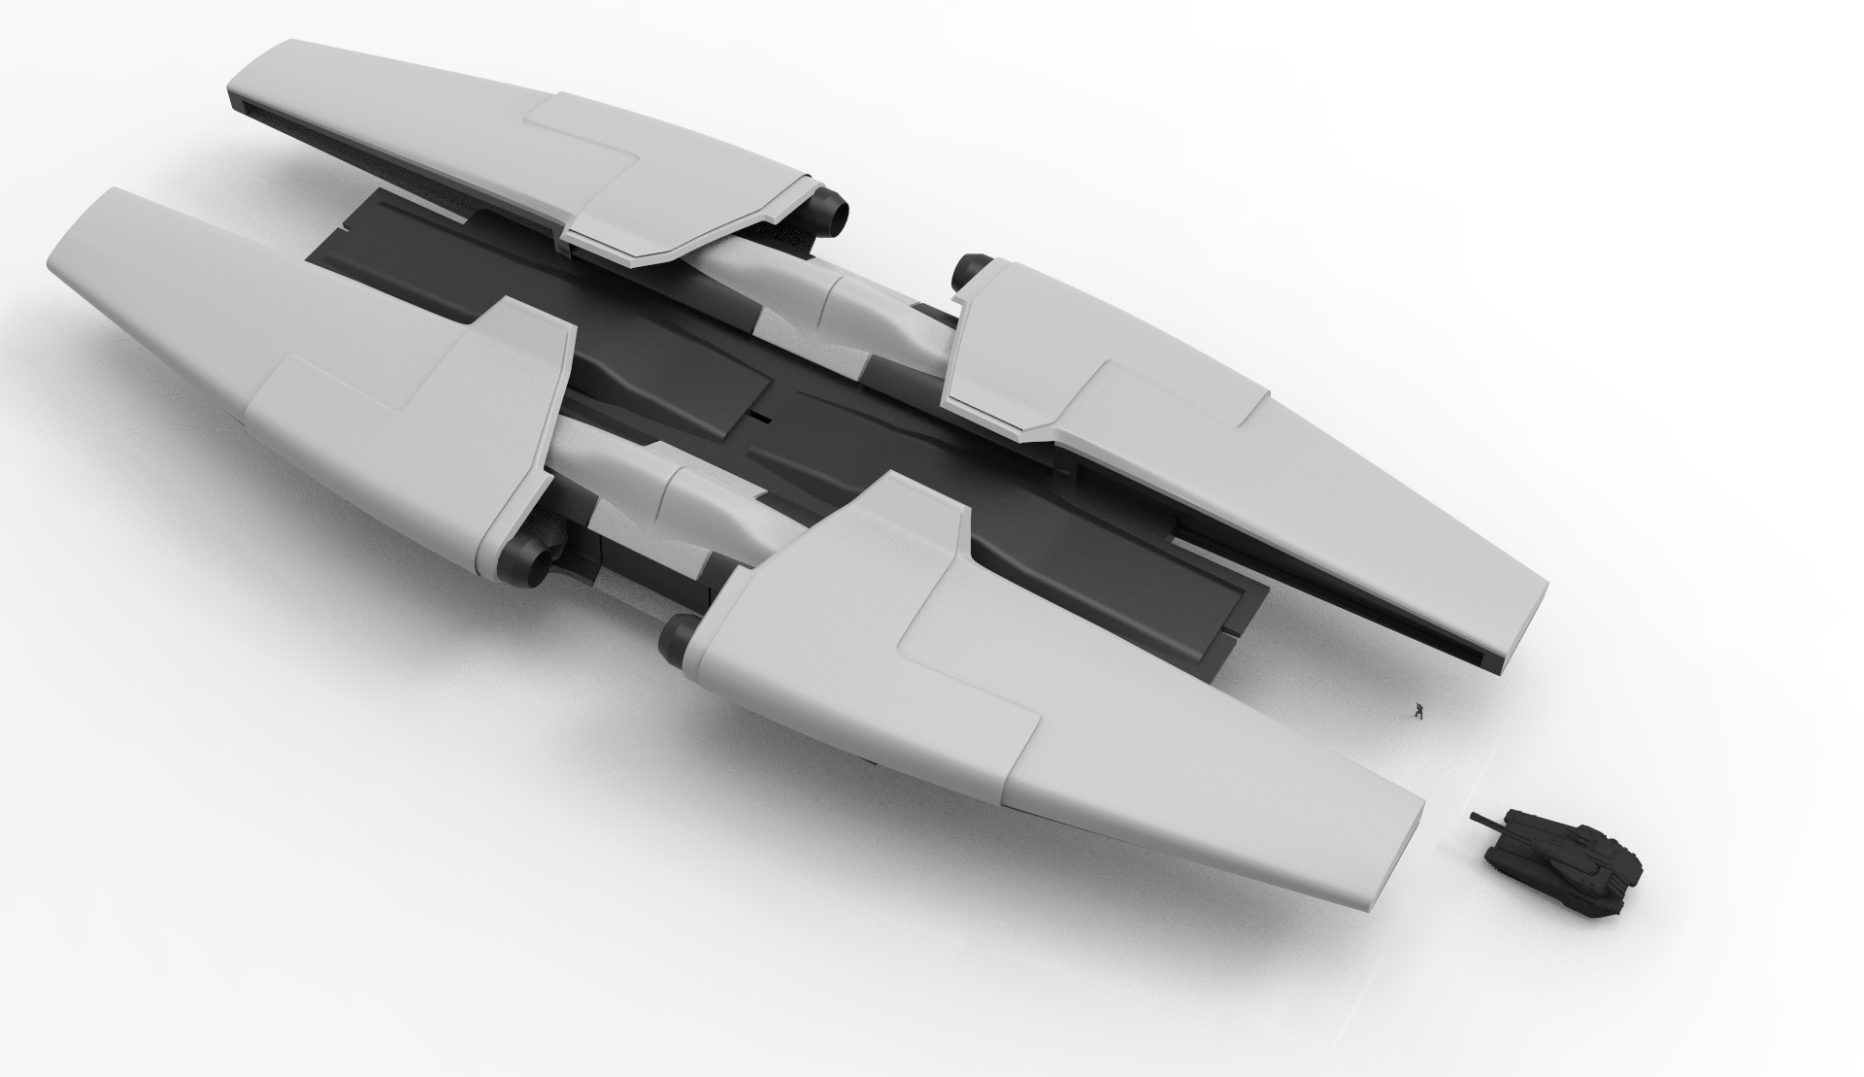 SC-Hercules-Concept-Art-1.jpg